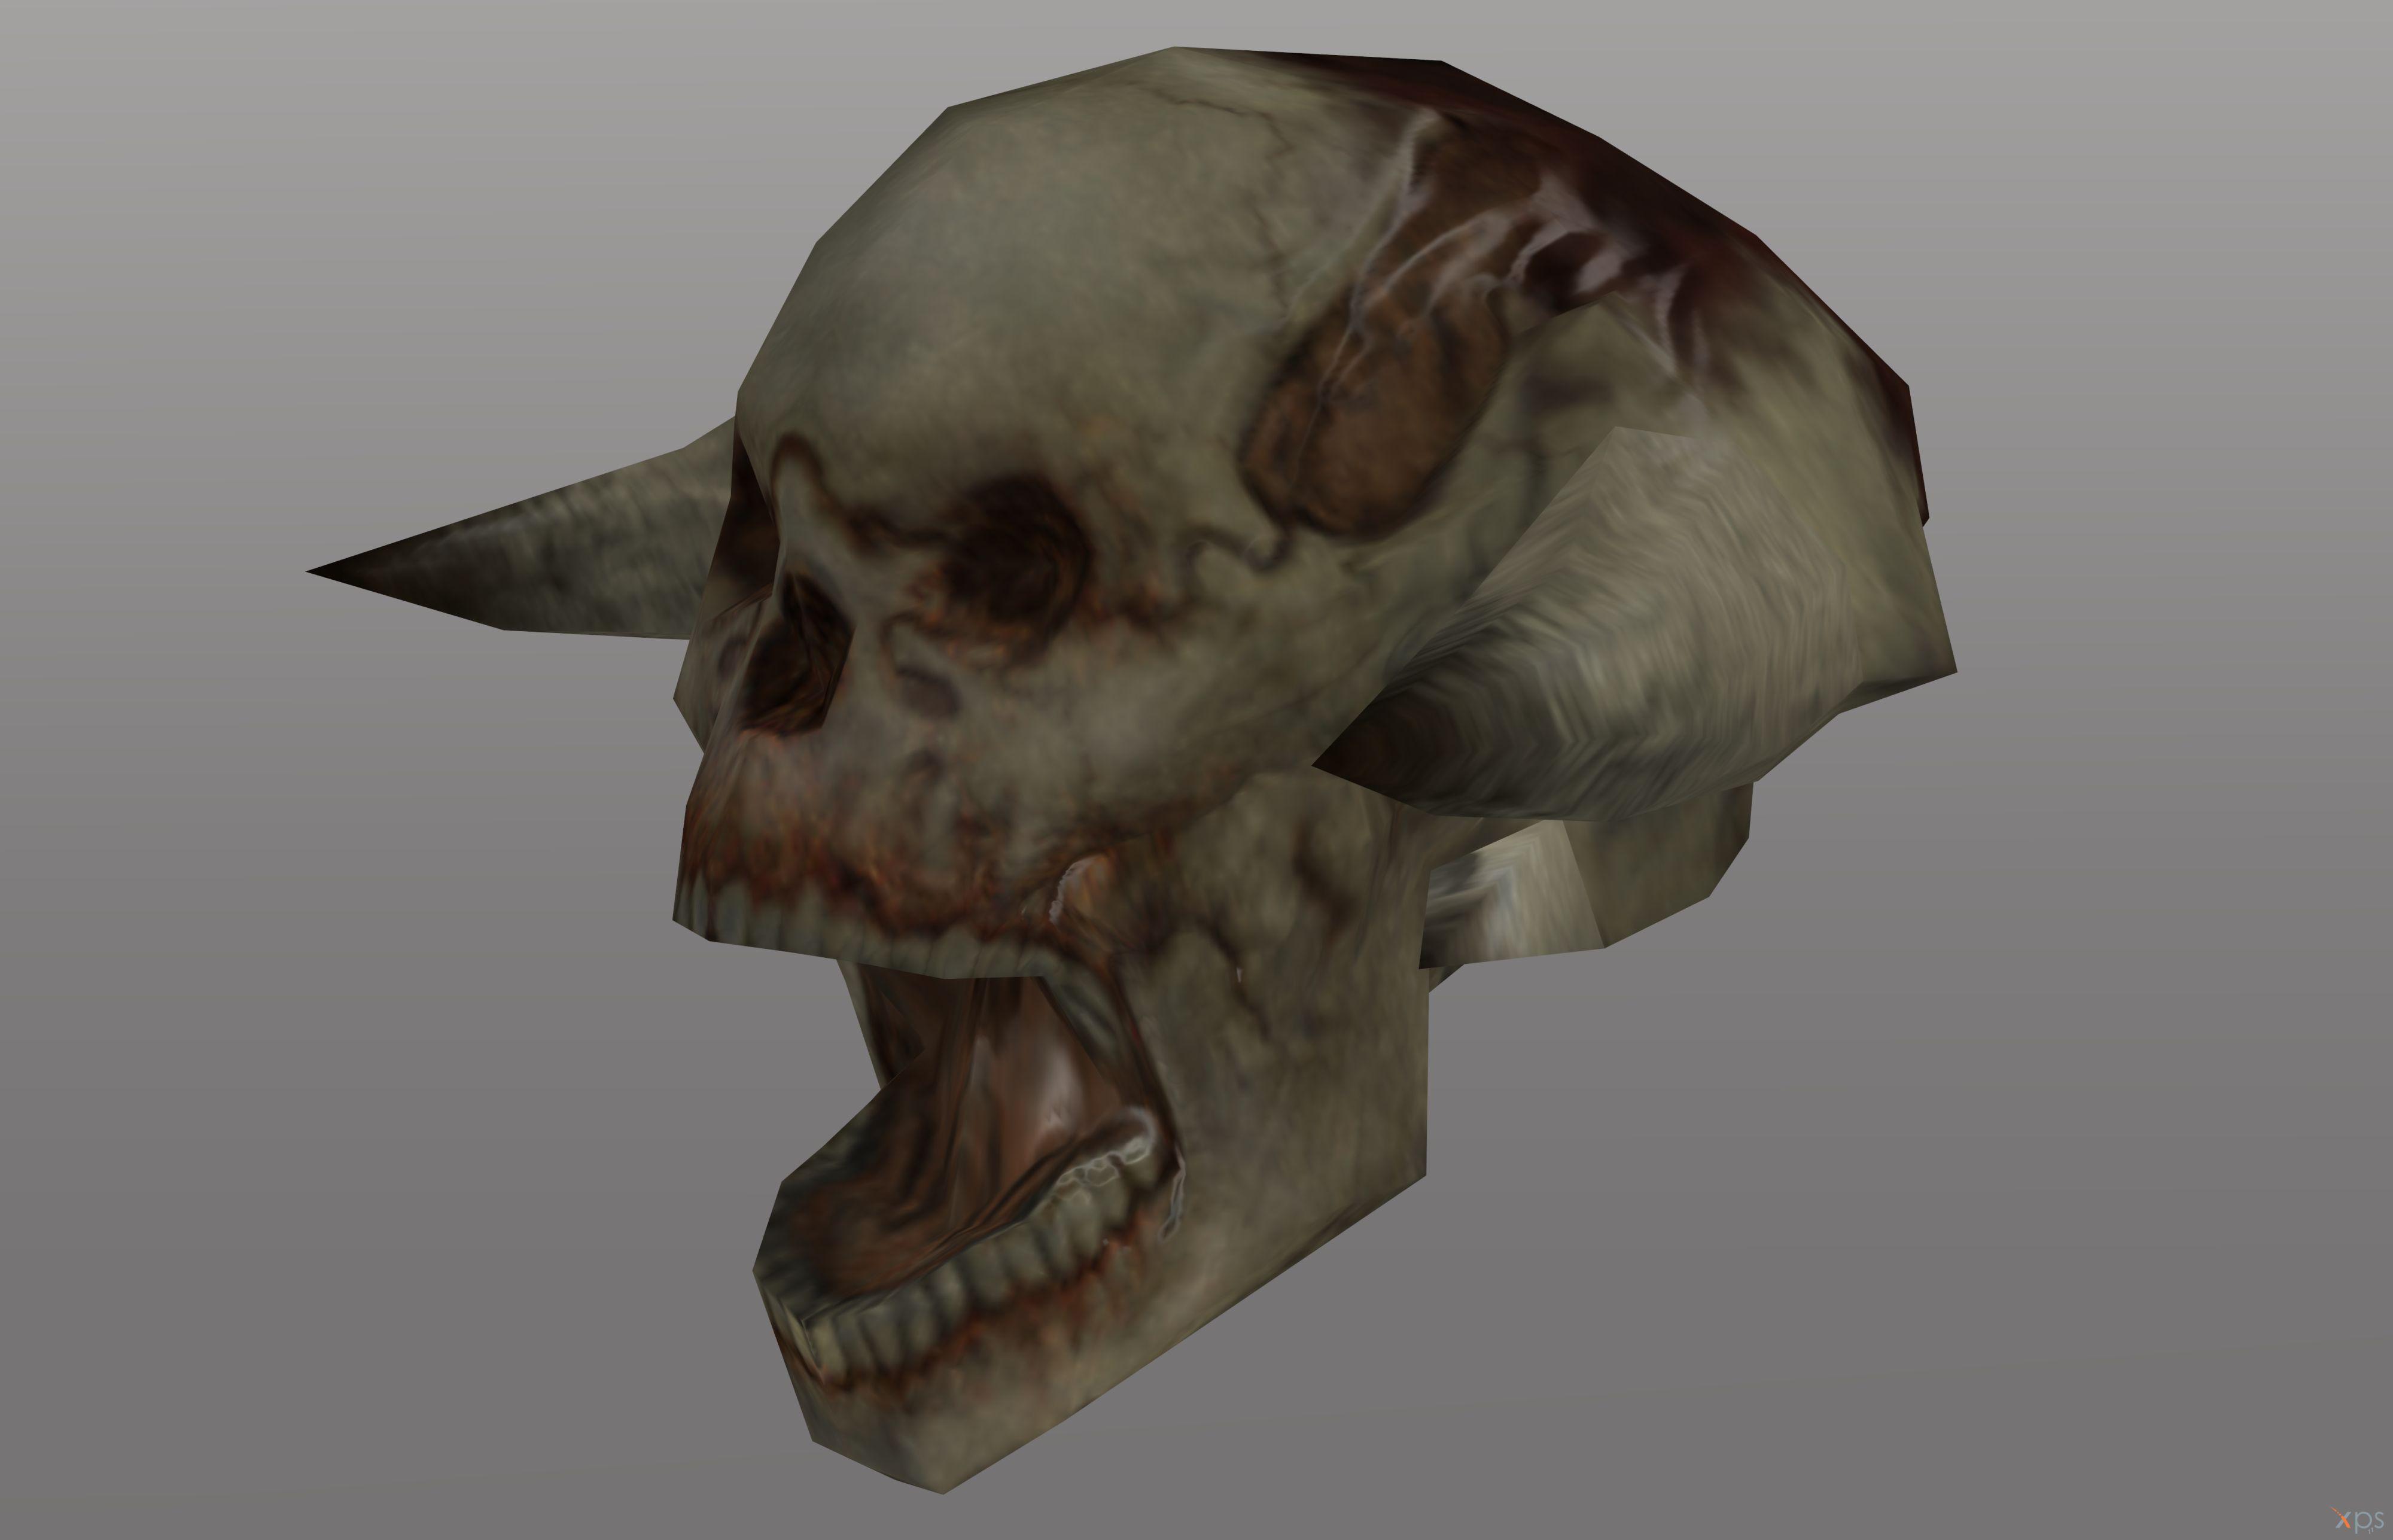 Lost Soul Doom Deviantart: 'DOOM 3' Forgotten Soul XPS ONLY!!! By Lezisell On DeviantArt